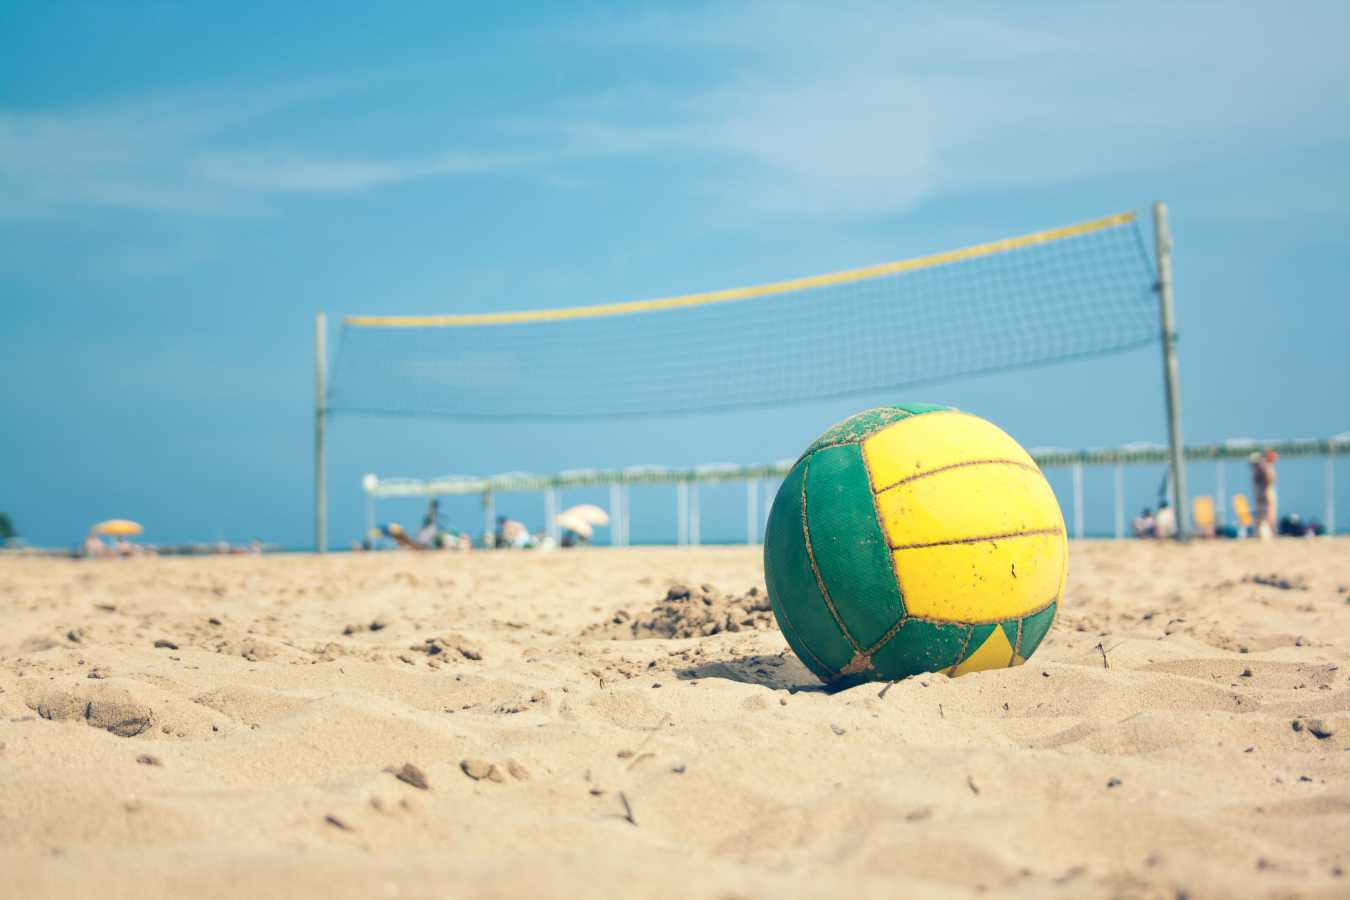 Beach_Volley_(8143063908)